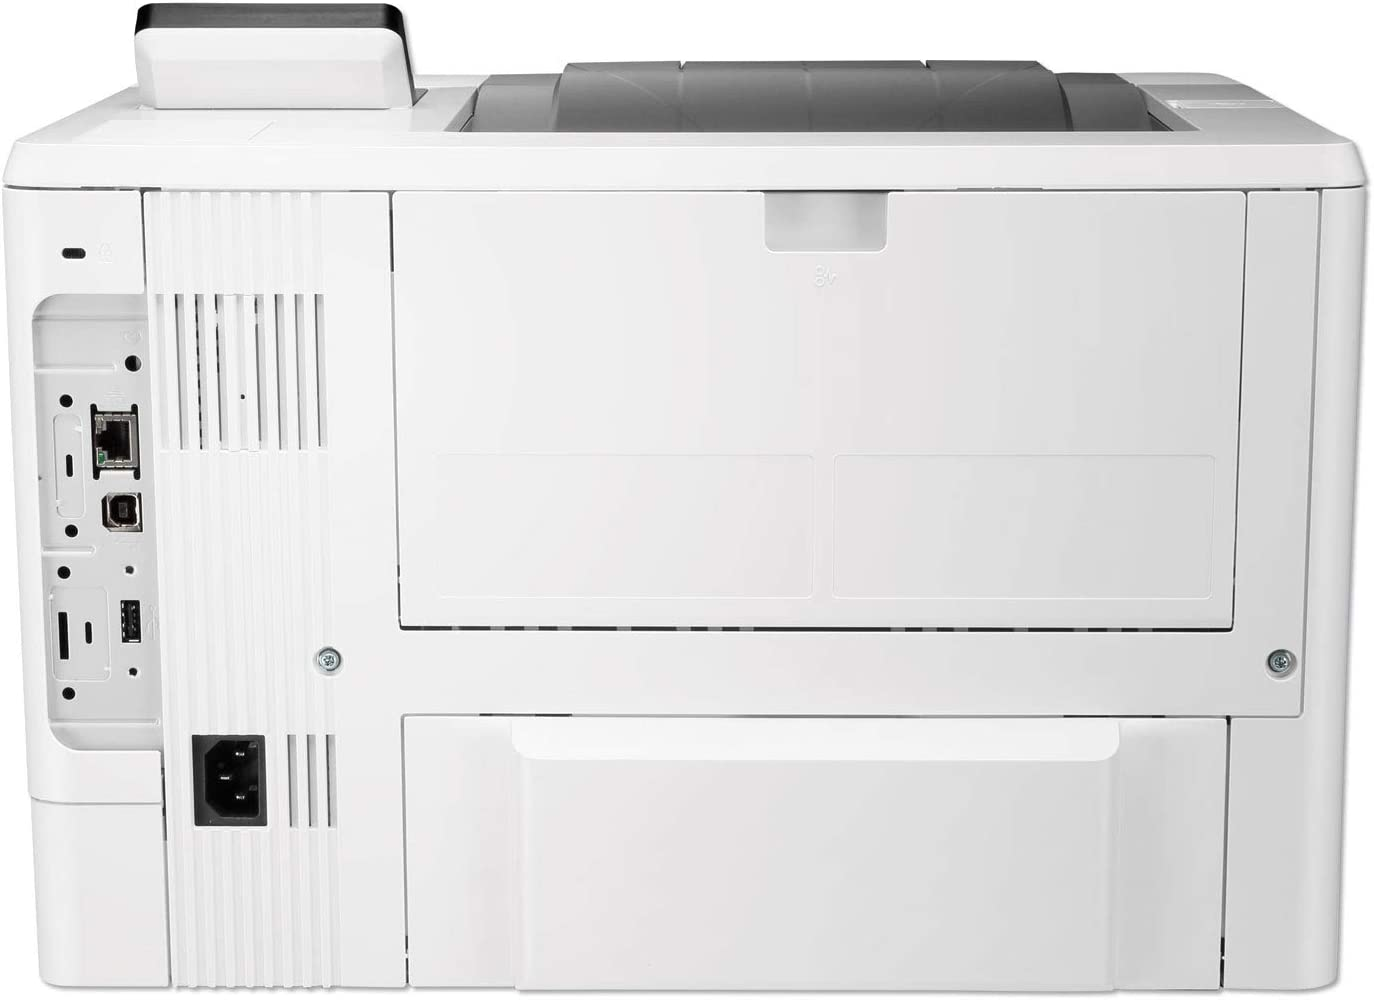 HP Laserjet Enterprise M507dn 1PV87A with Power Strip Surge Protector